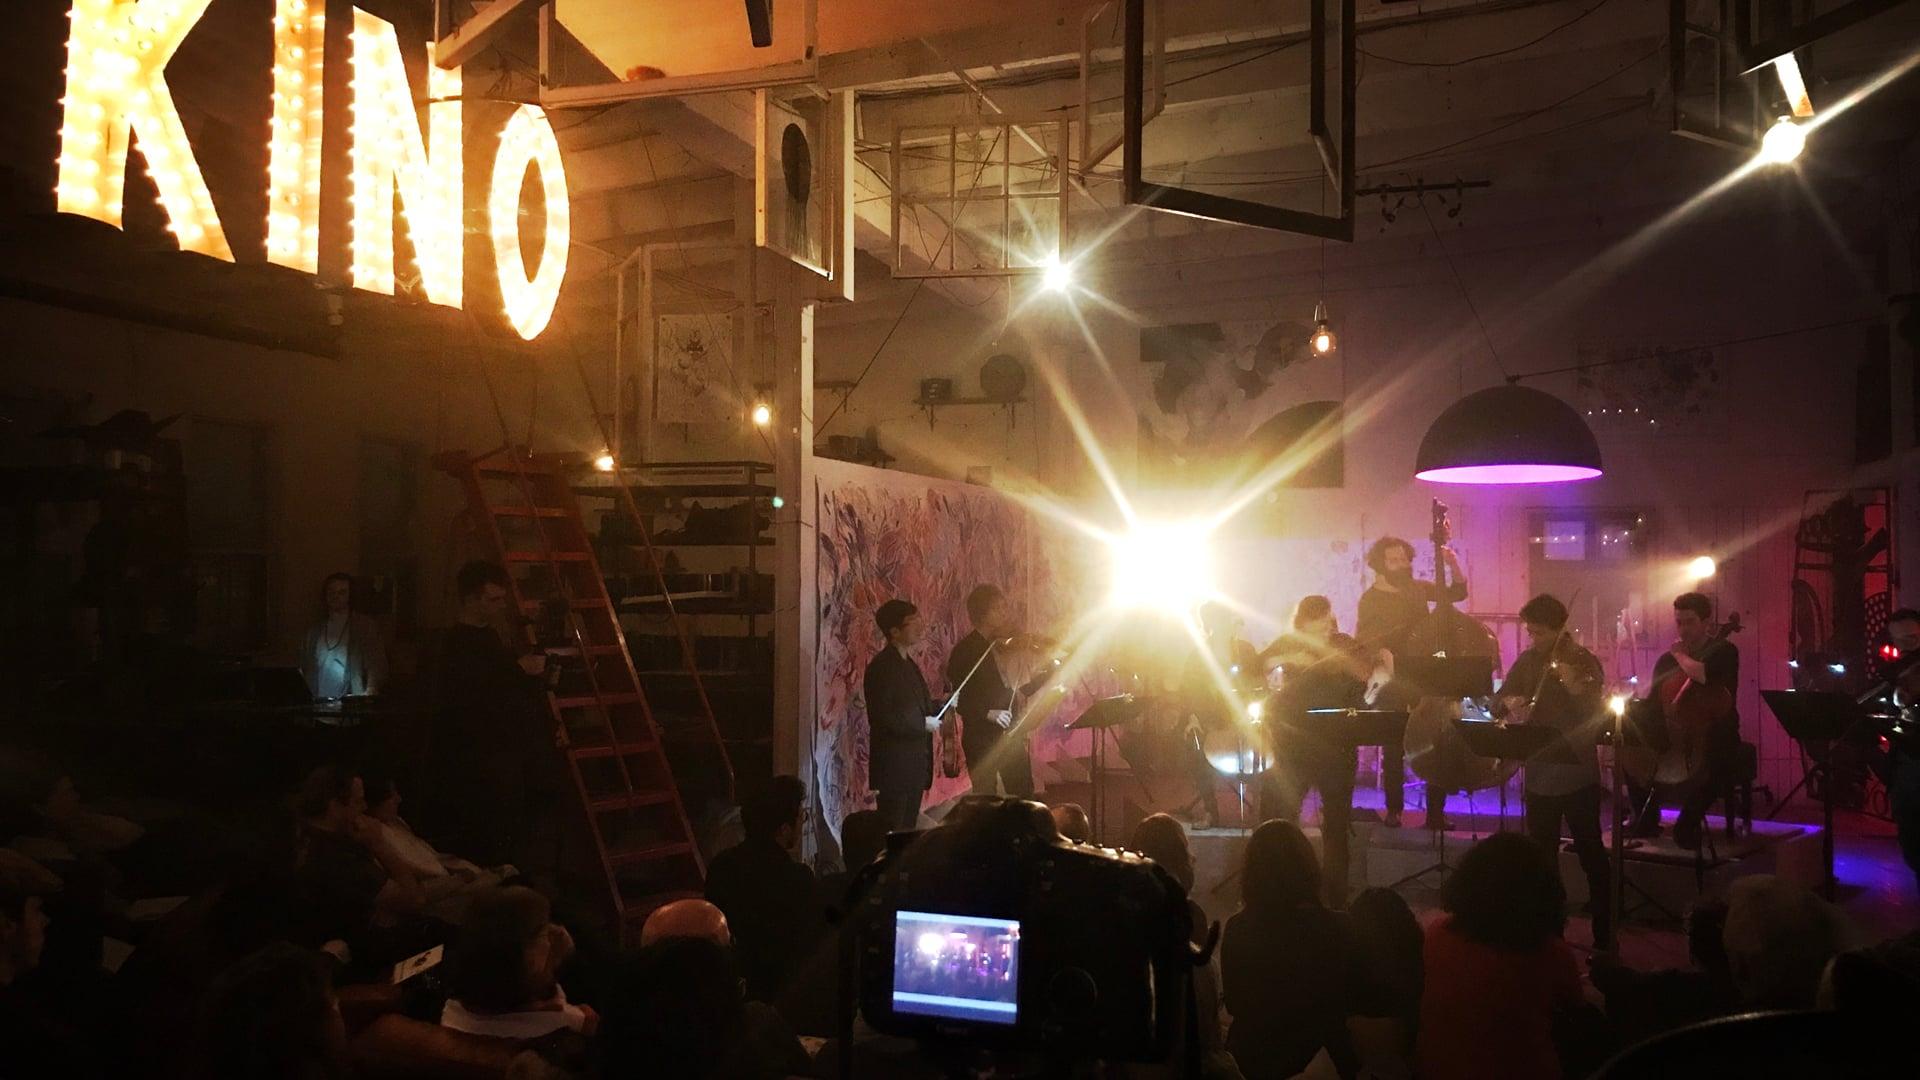 collectif9 - Night of the Flying Horses - 08 - Lúa Descolorida (Osvaldo Golijov)